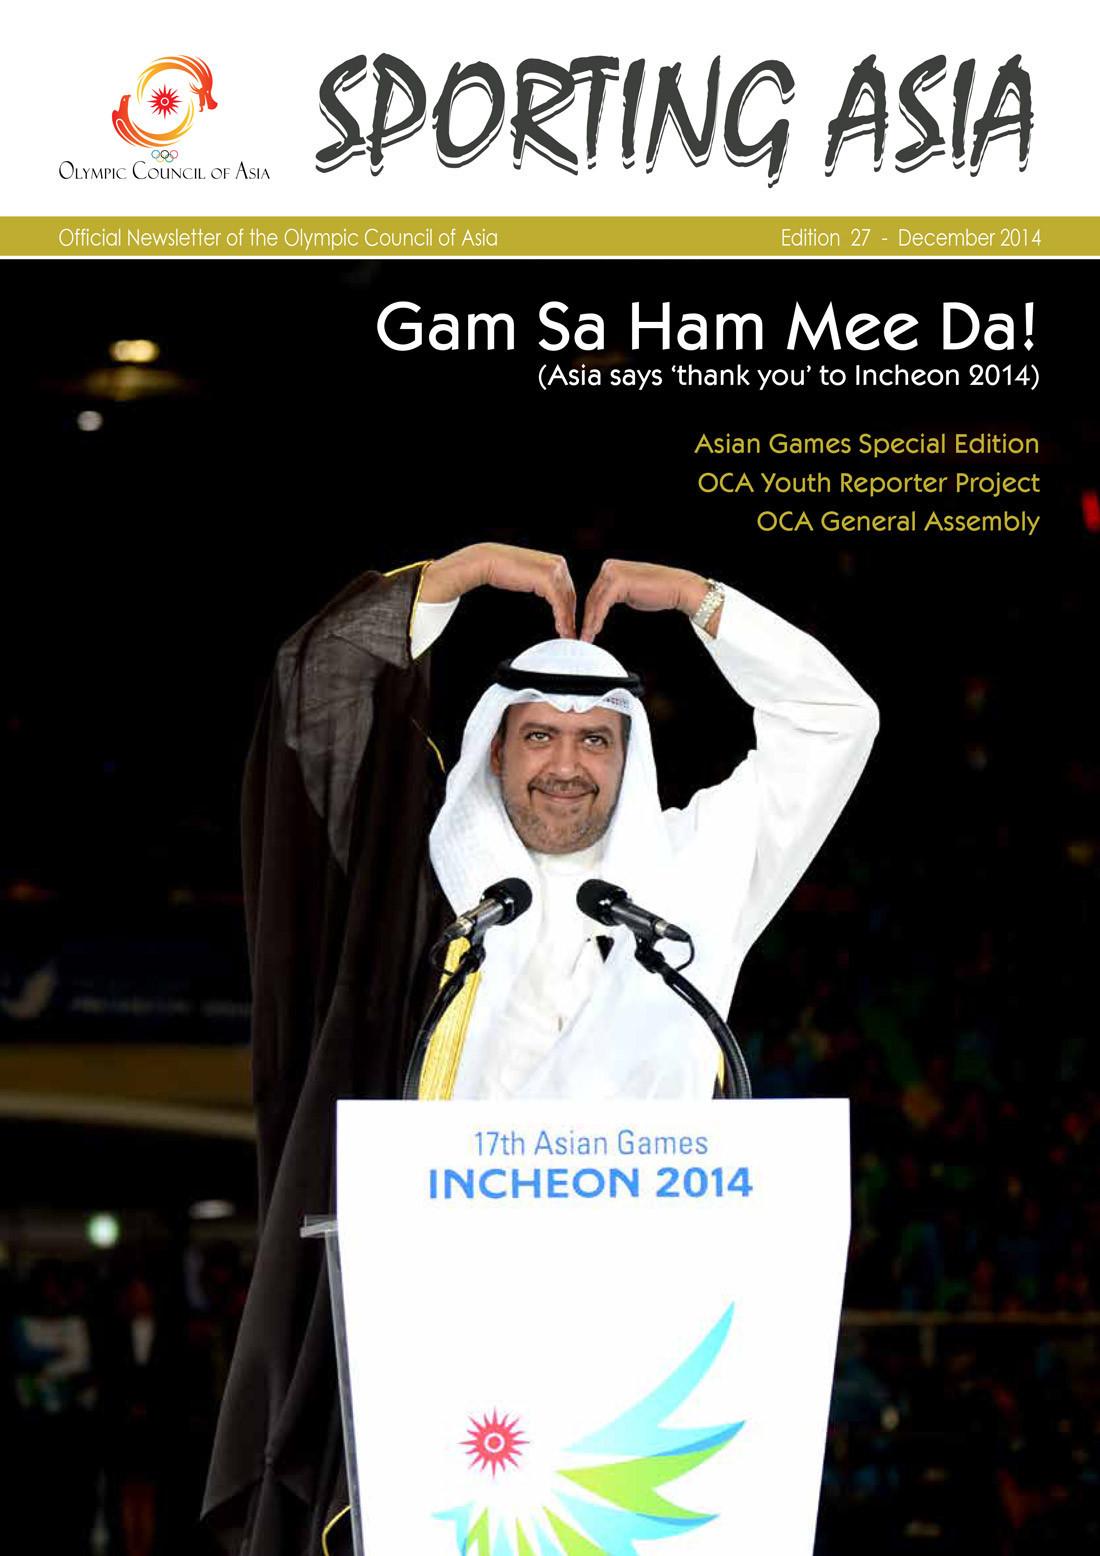 Sporting Asia - Edition 27 - DEC 2014